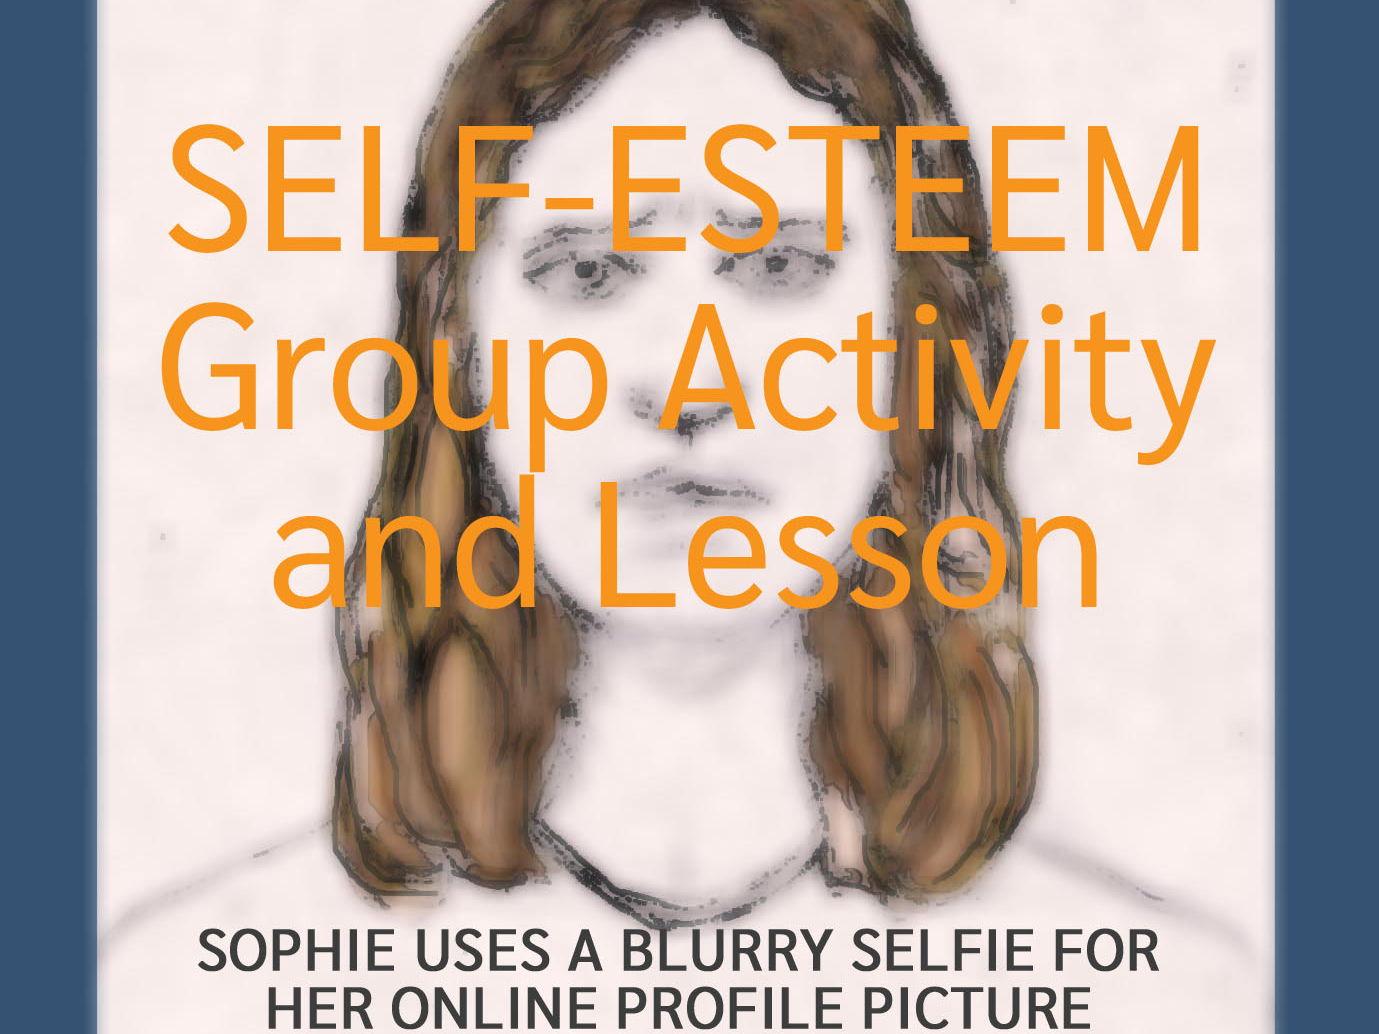 Self-esteem Lesson, Poster, Emotional Mime and Read My Body Language KS3/KS4 Bundle (UK)